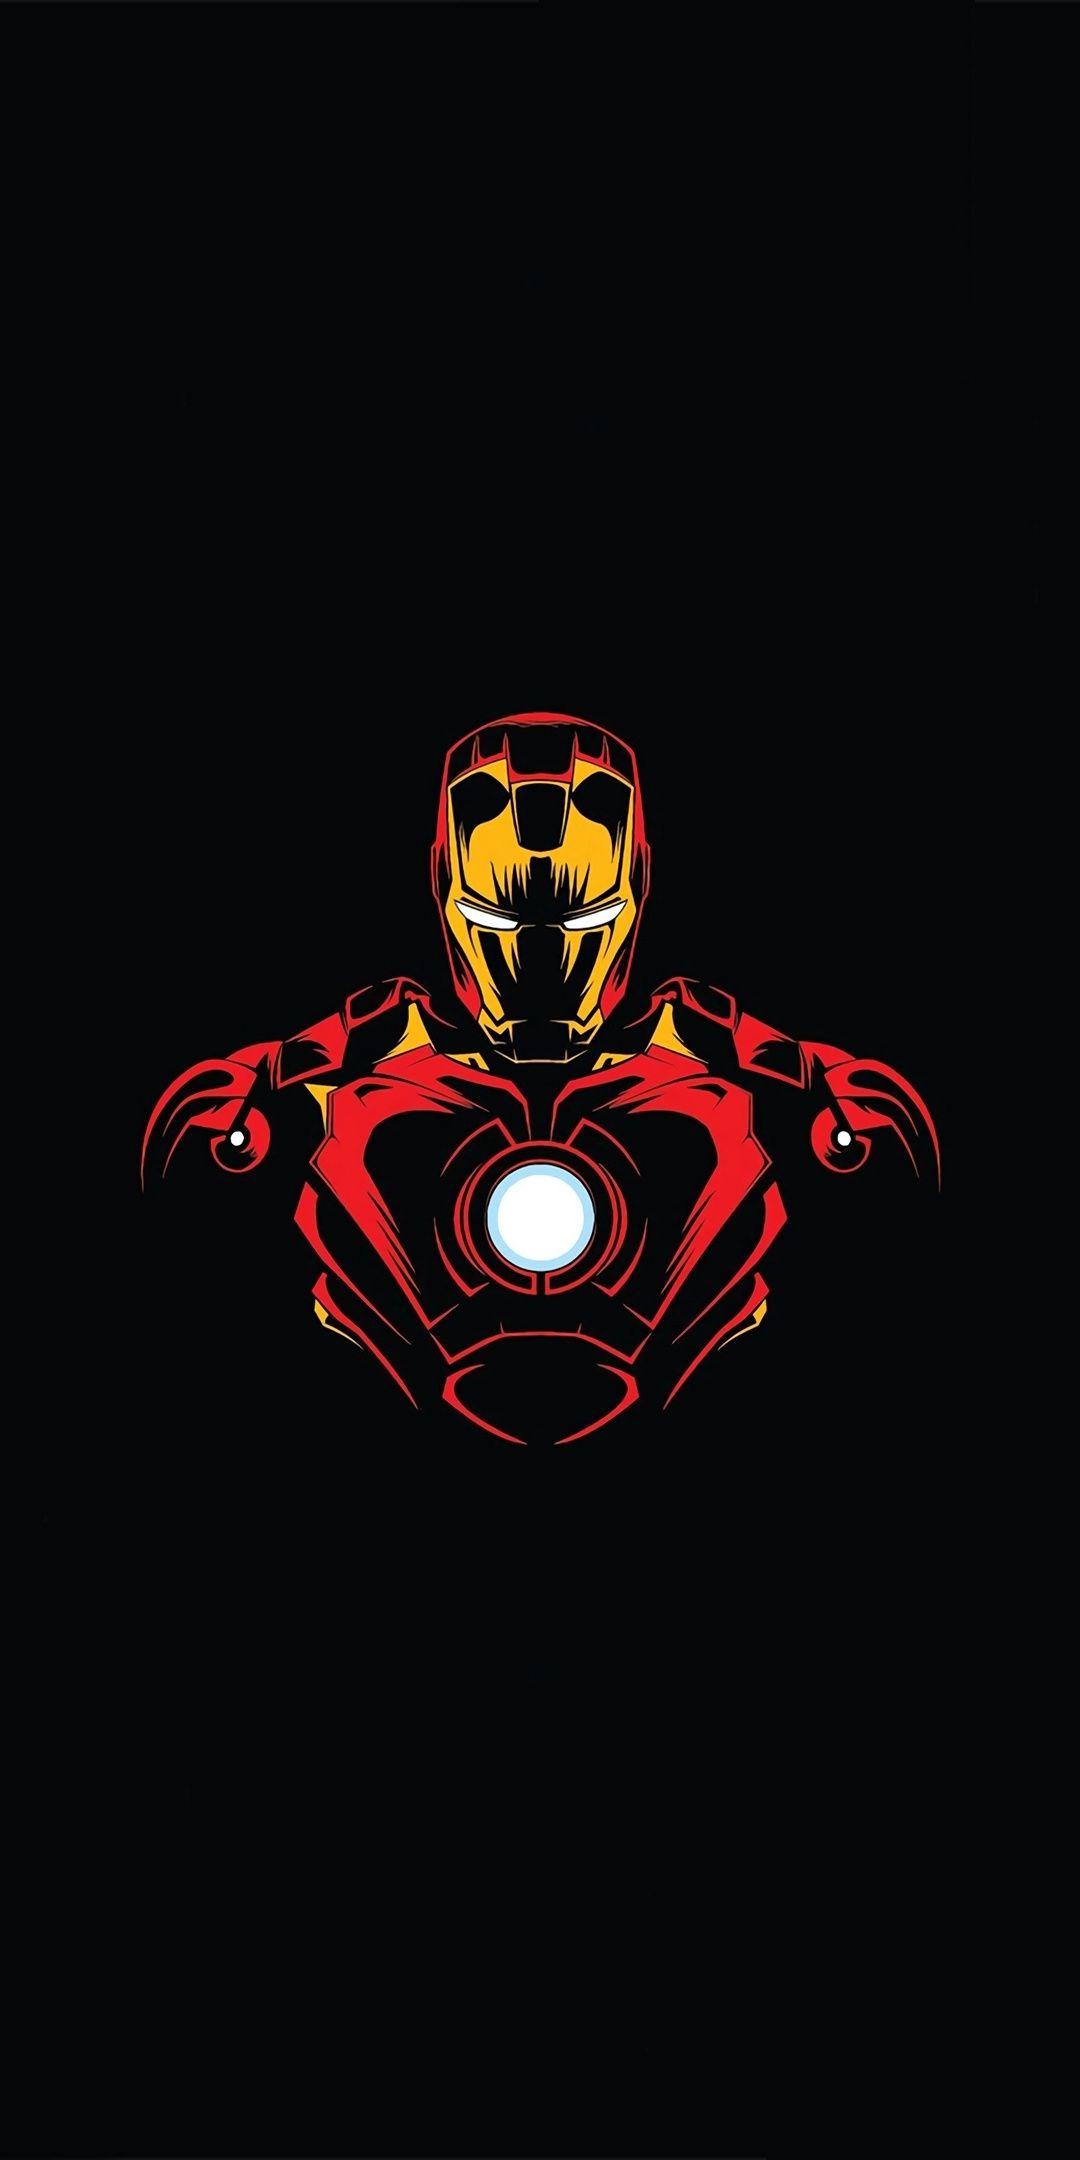 Hero, Iron man, minimalist, 1080x2160 wallpaper